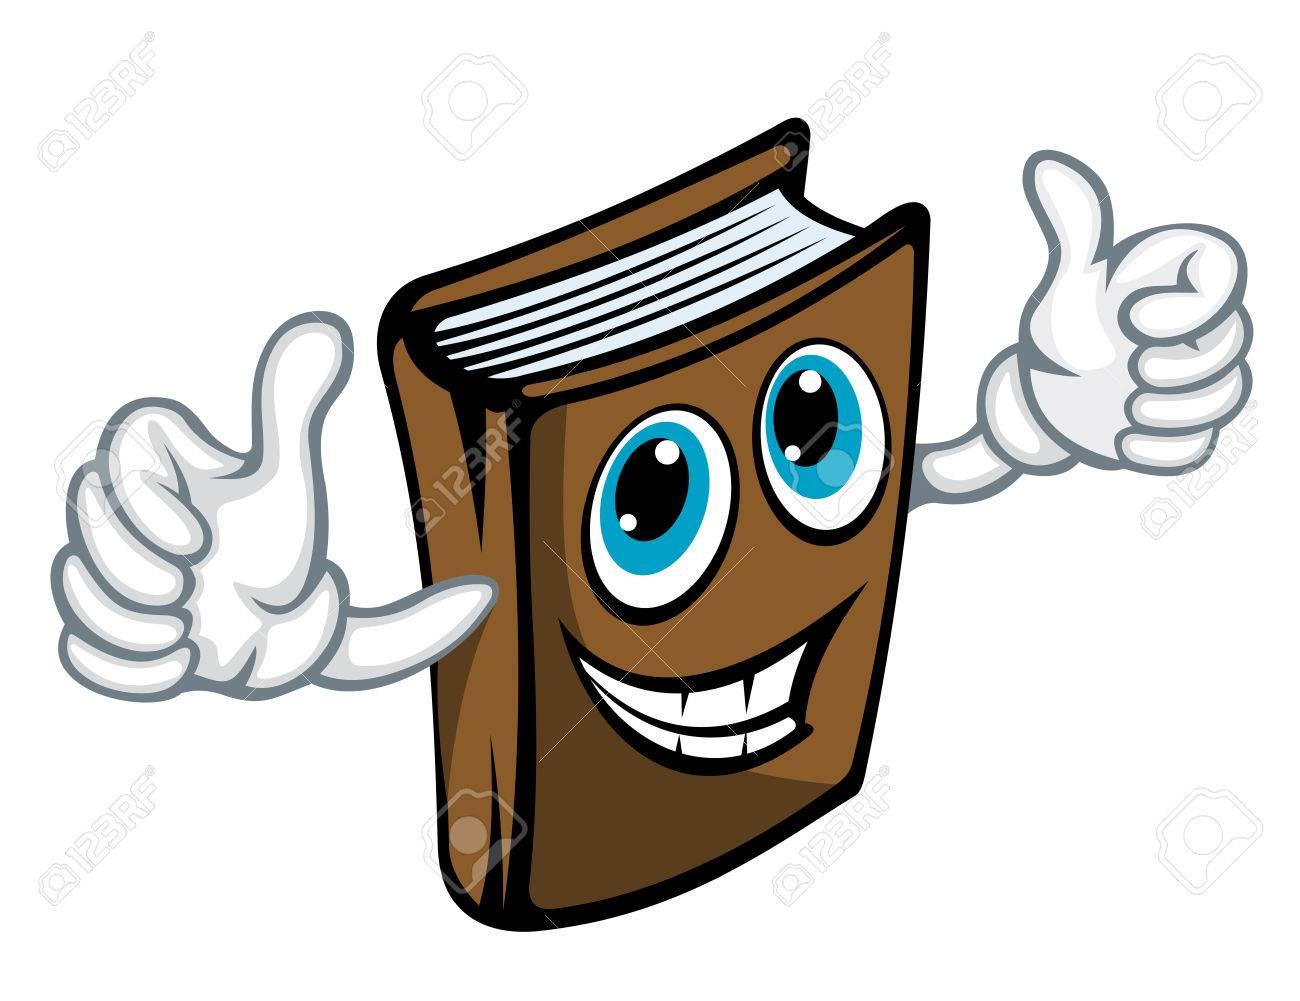 Cartoon book makes good gesture. Vector illustration Stock Vector - 22472365